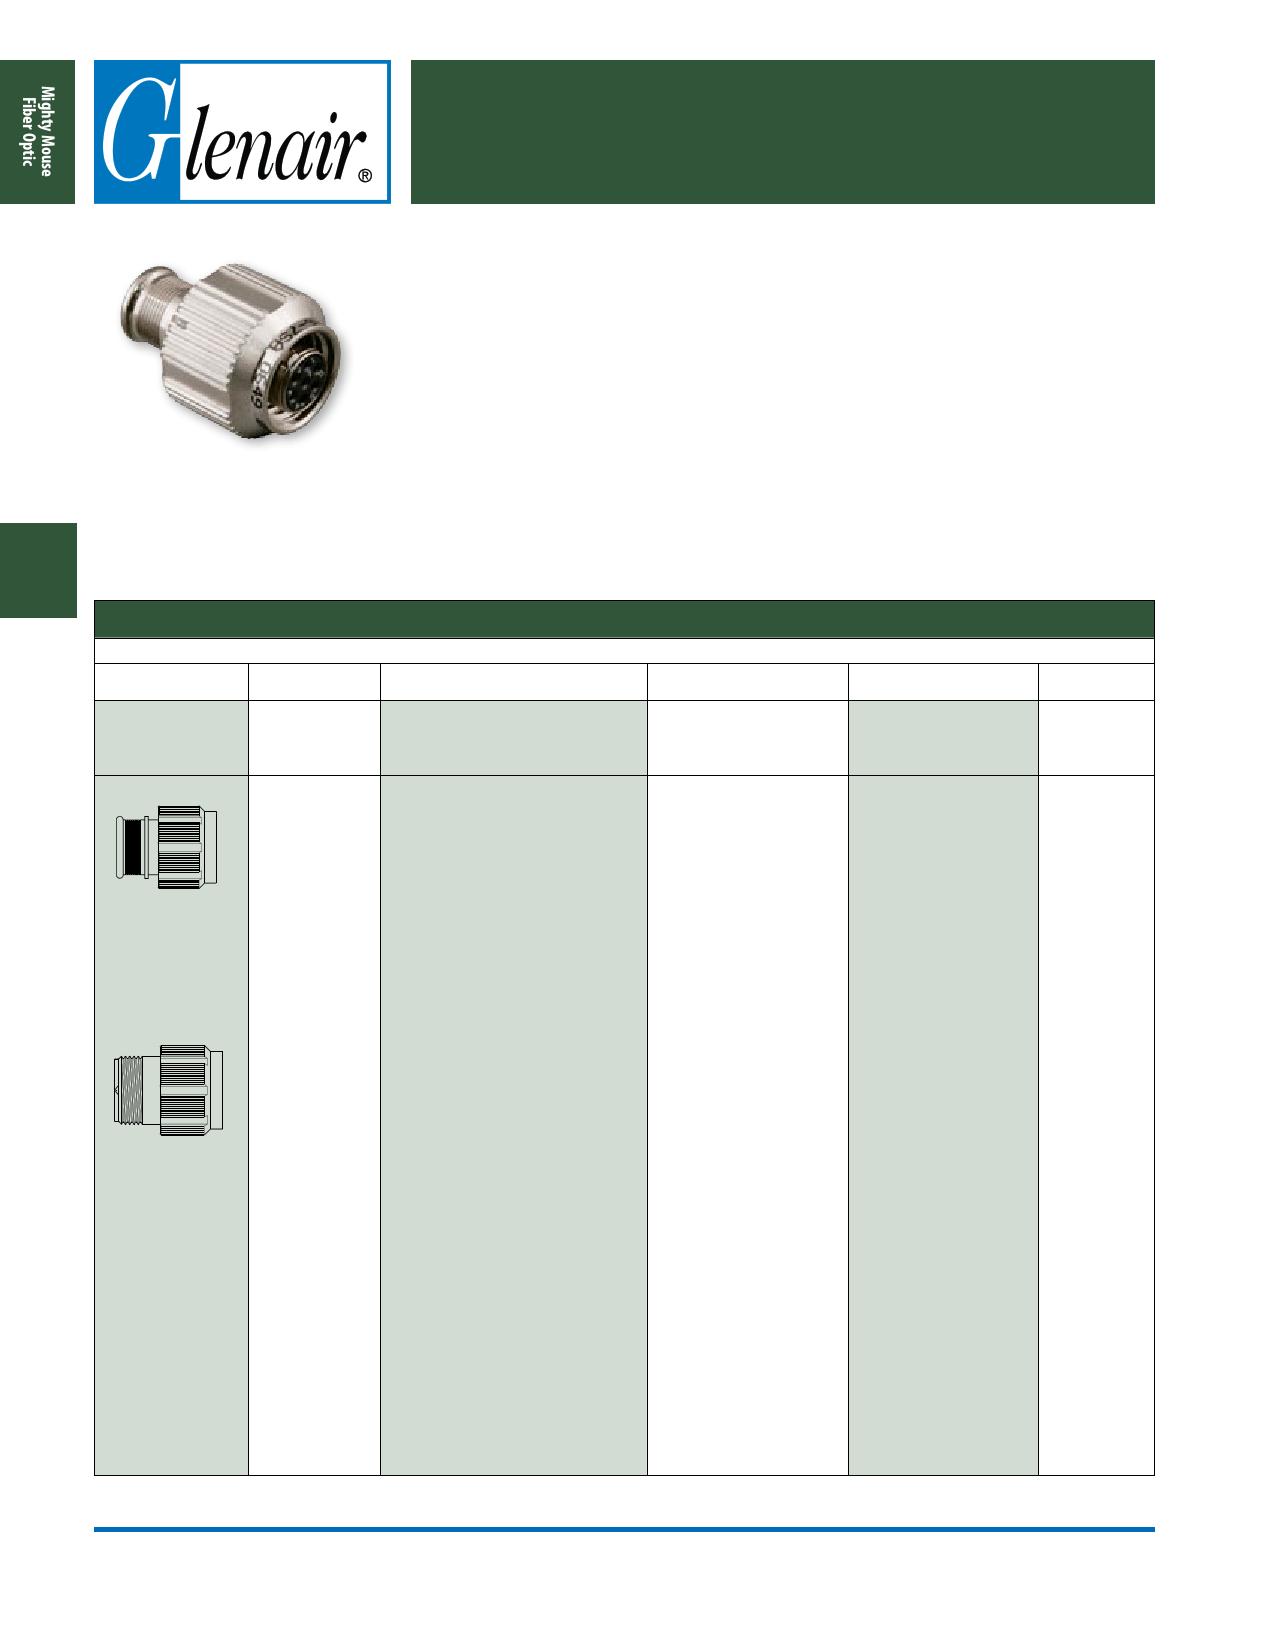 801-007-16xxxx datasheet